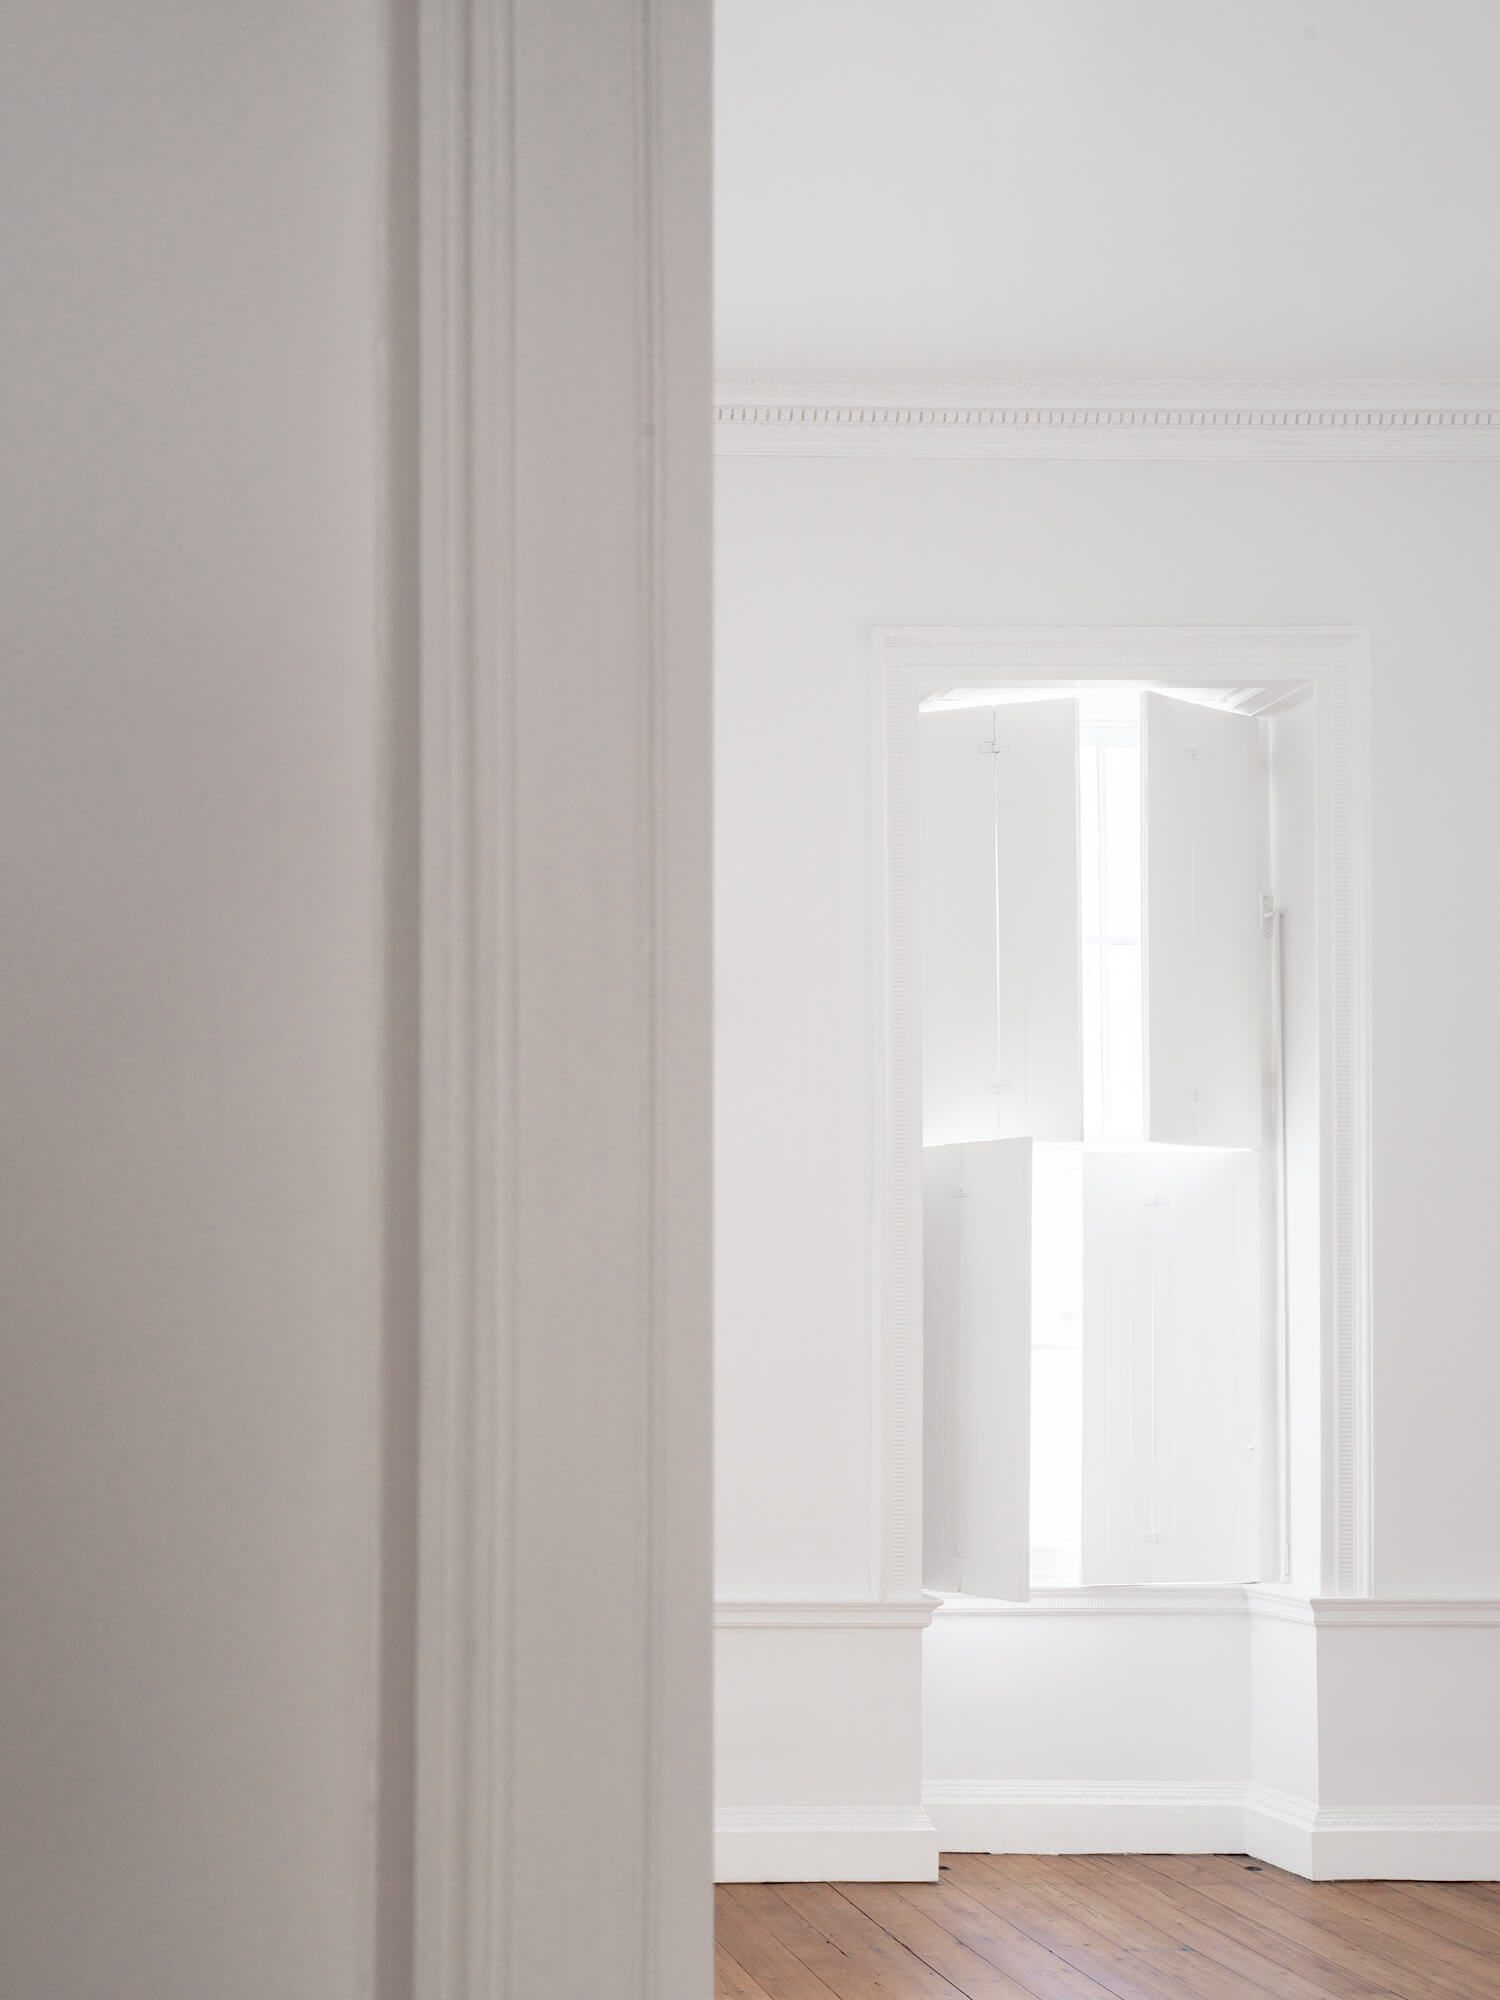 est living HASA Architects Mayfair Apartment 9